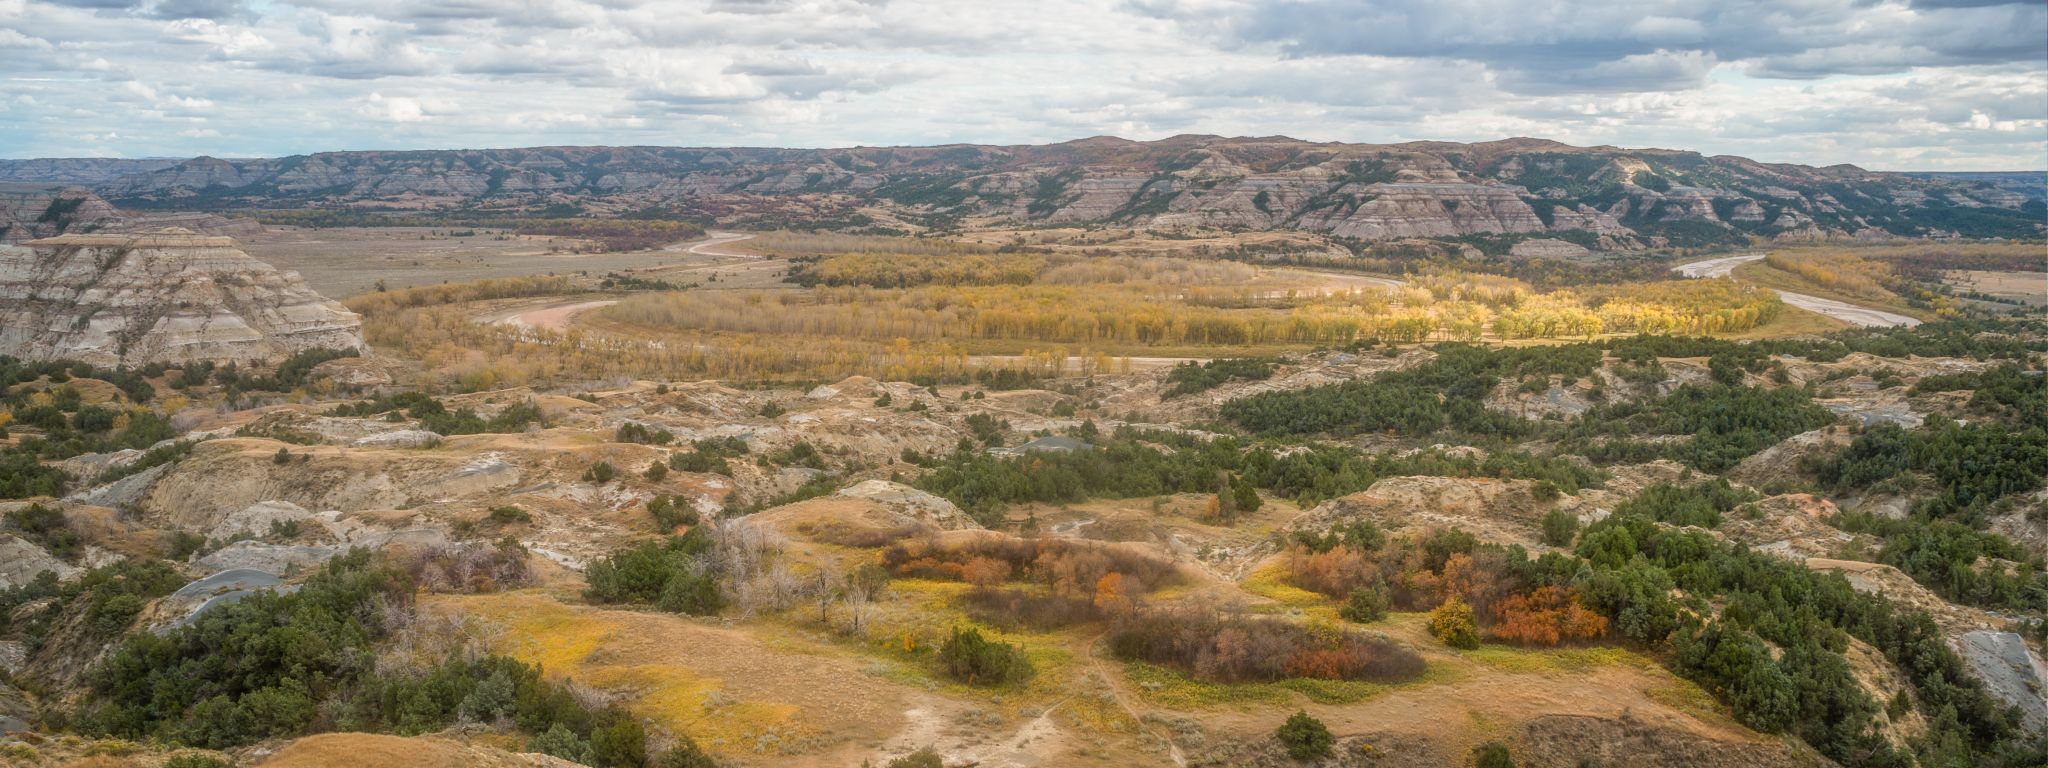 Theodore Roosevelt National Park - Oxbow Overlook, USA